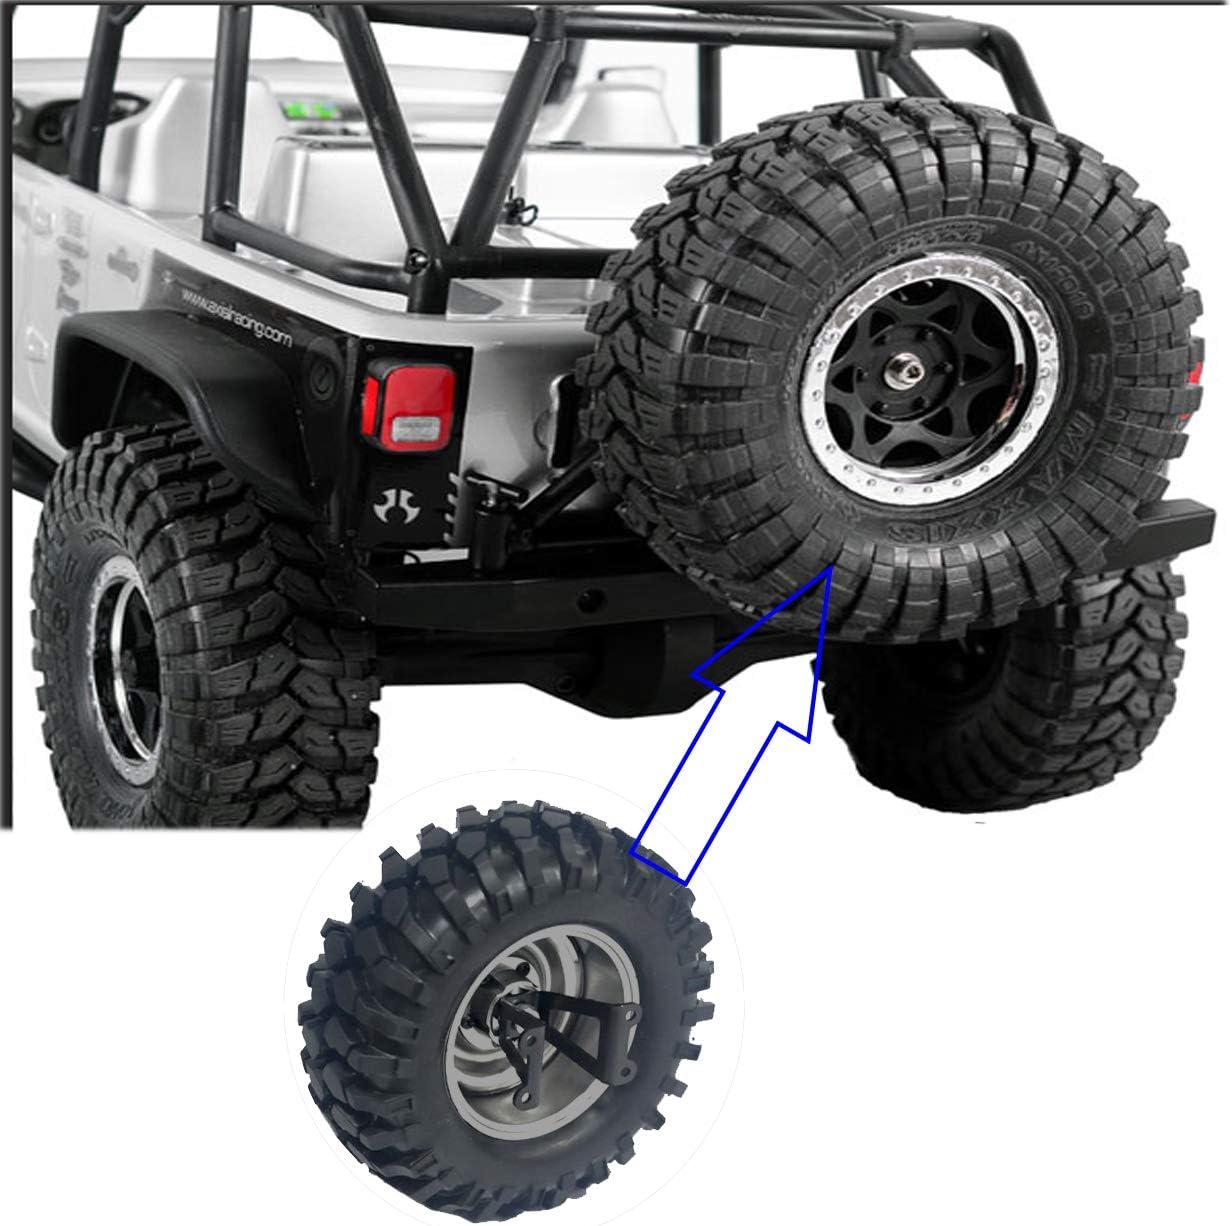 Green 4PCS ShareGoo Aluminium RC M4 Wheel Nut,RC Car Dustproof Wheel Rim Center Cap Hub for Traxxas TRX4 Axial SCX10 90046 D90 Tamiya Redcat HPI 1//10 RC Crawler Car